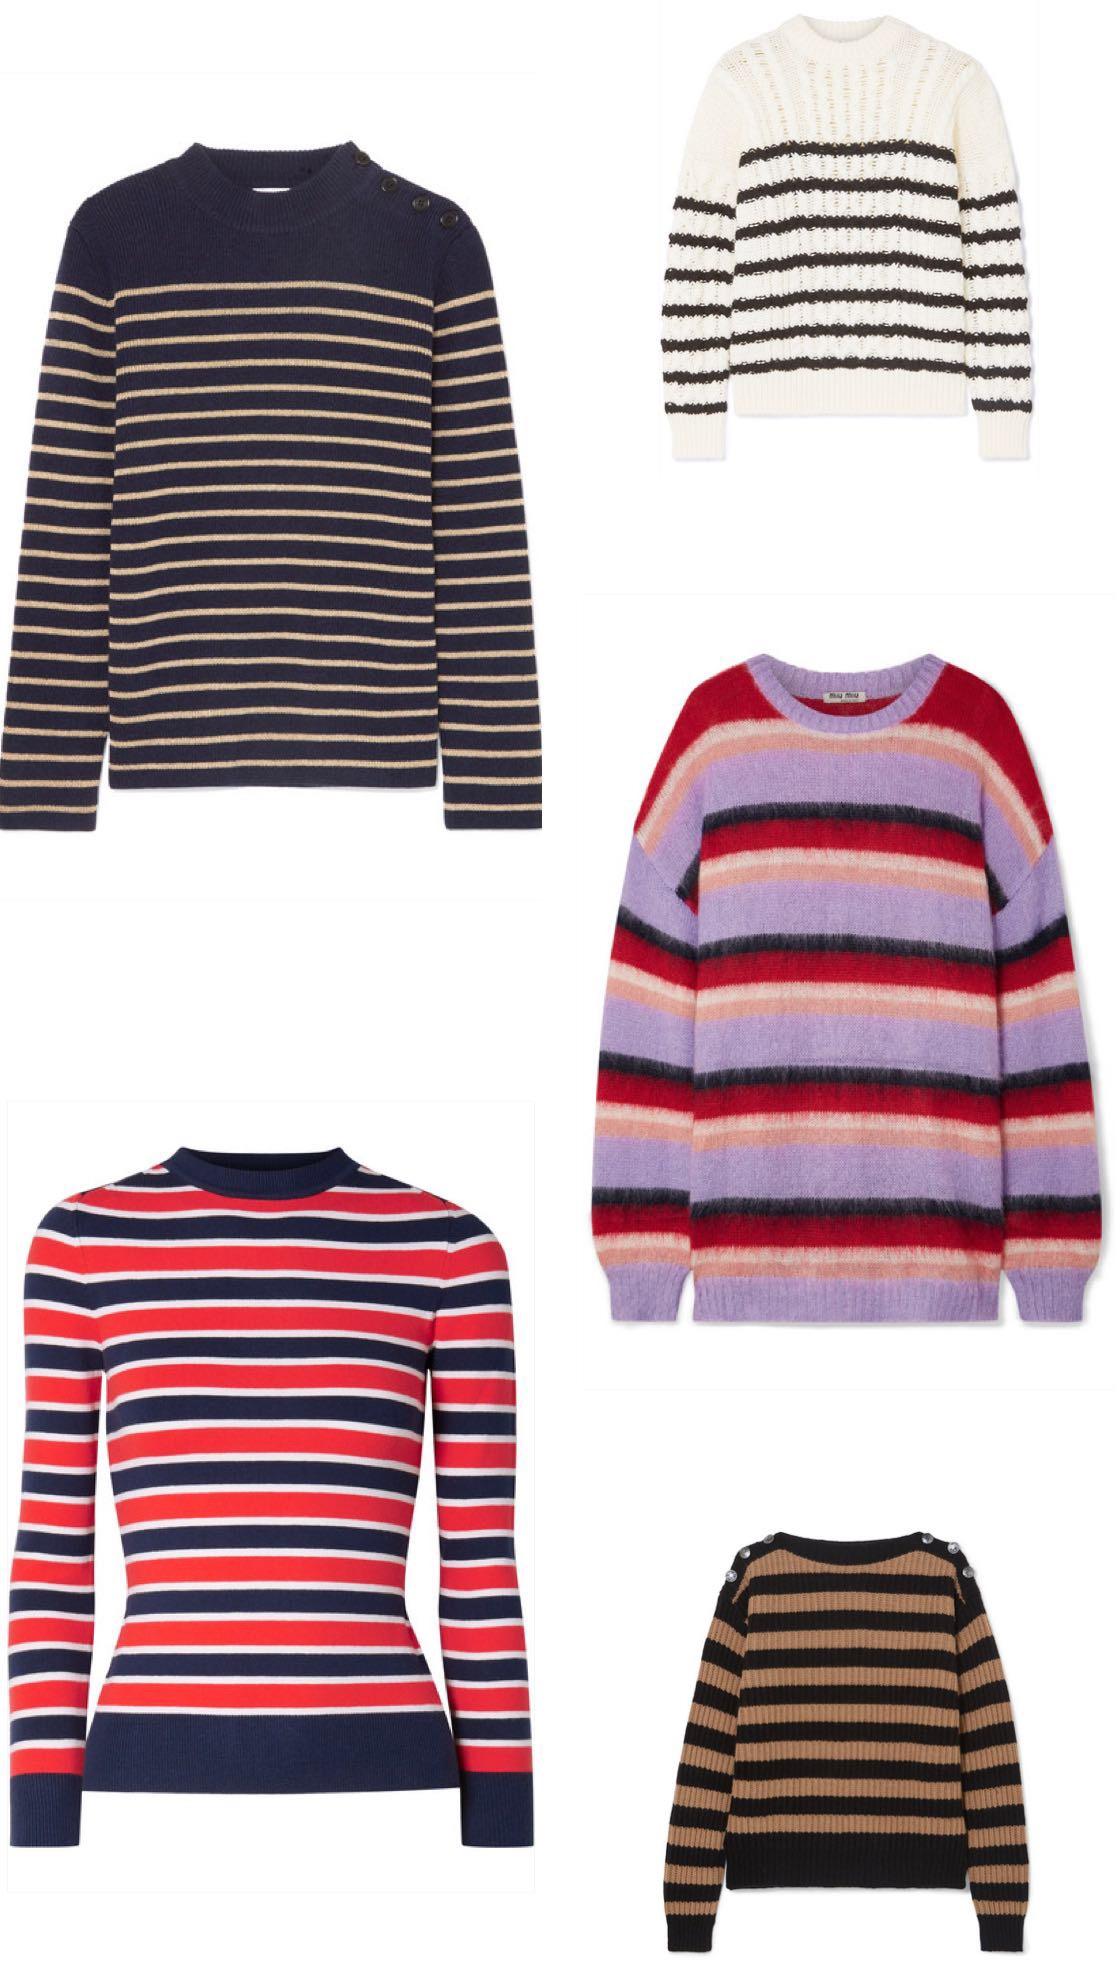 stripete gensere på luksus